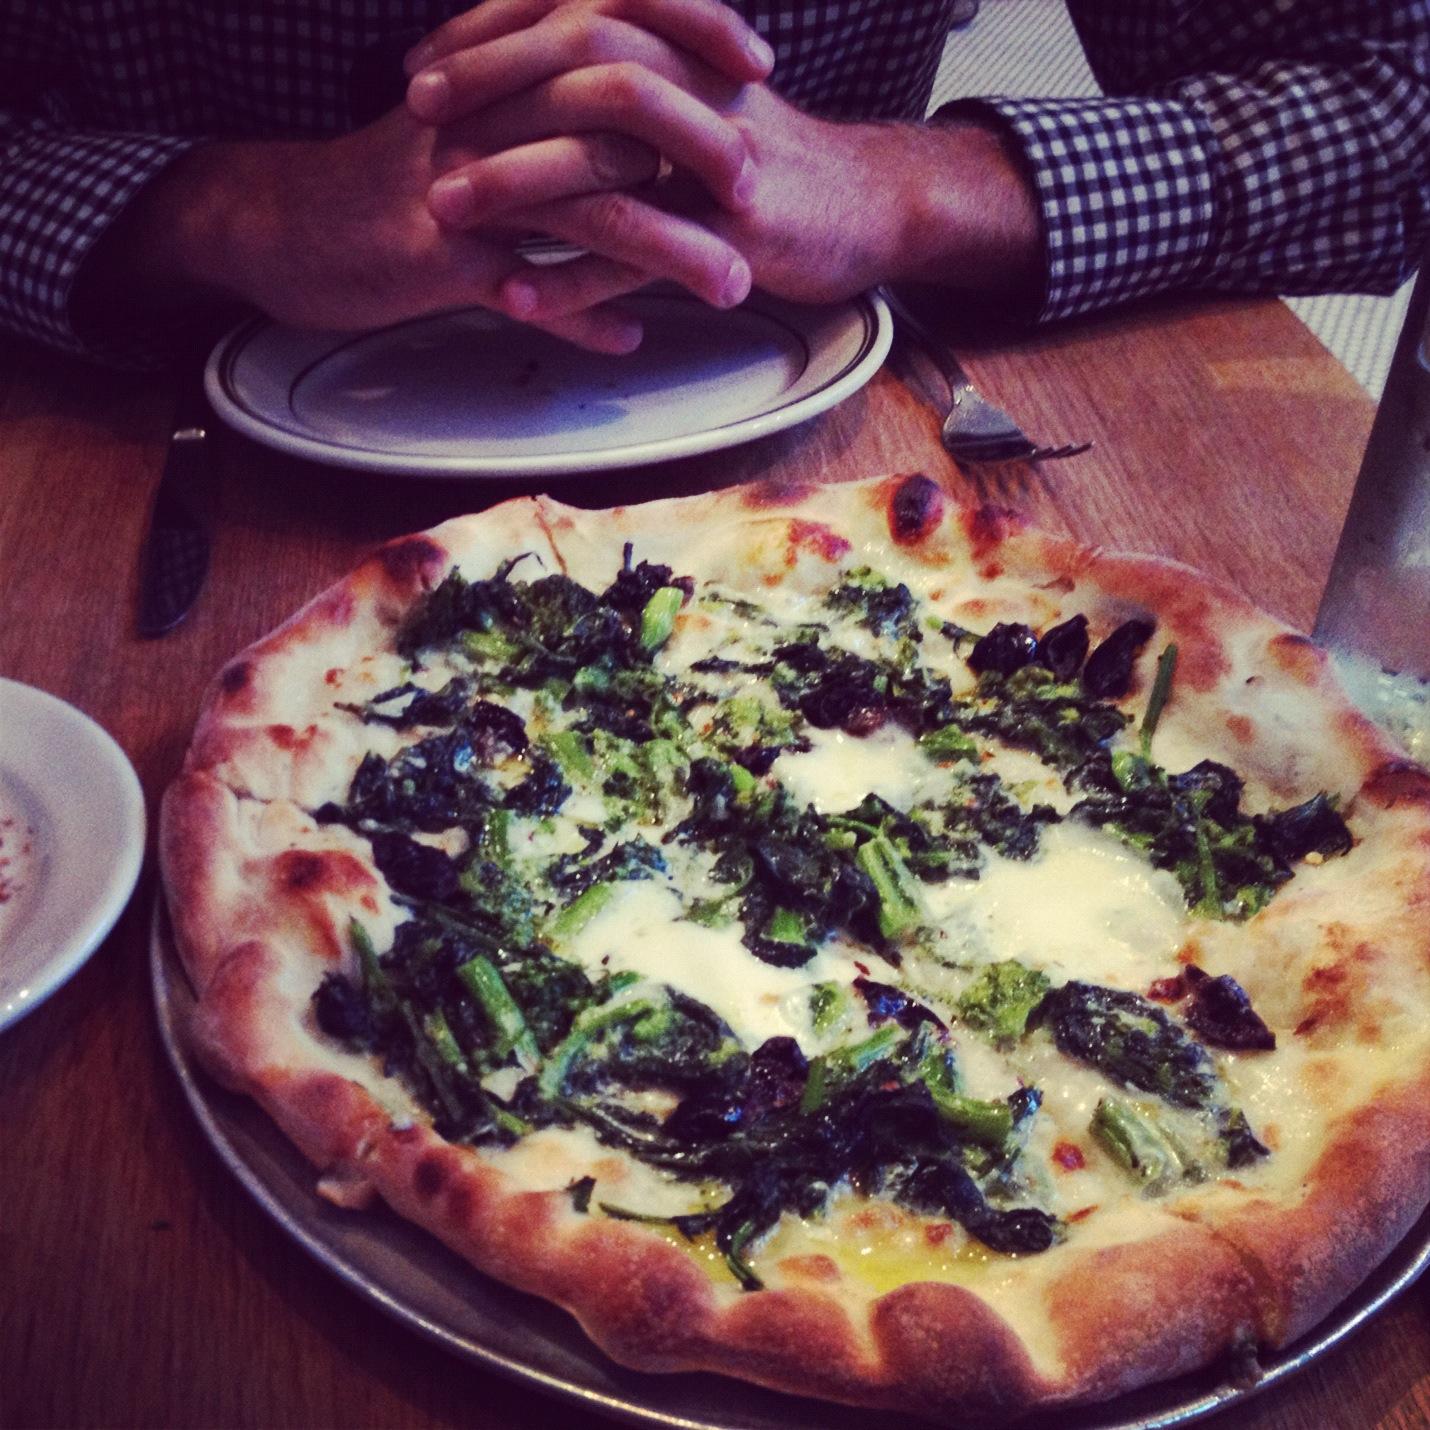 Pizza at Delfina.JPG